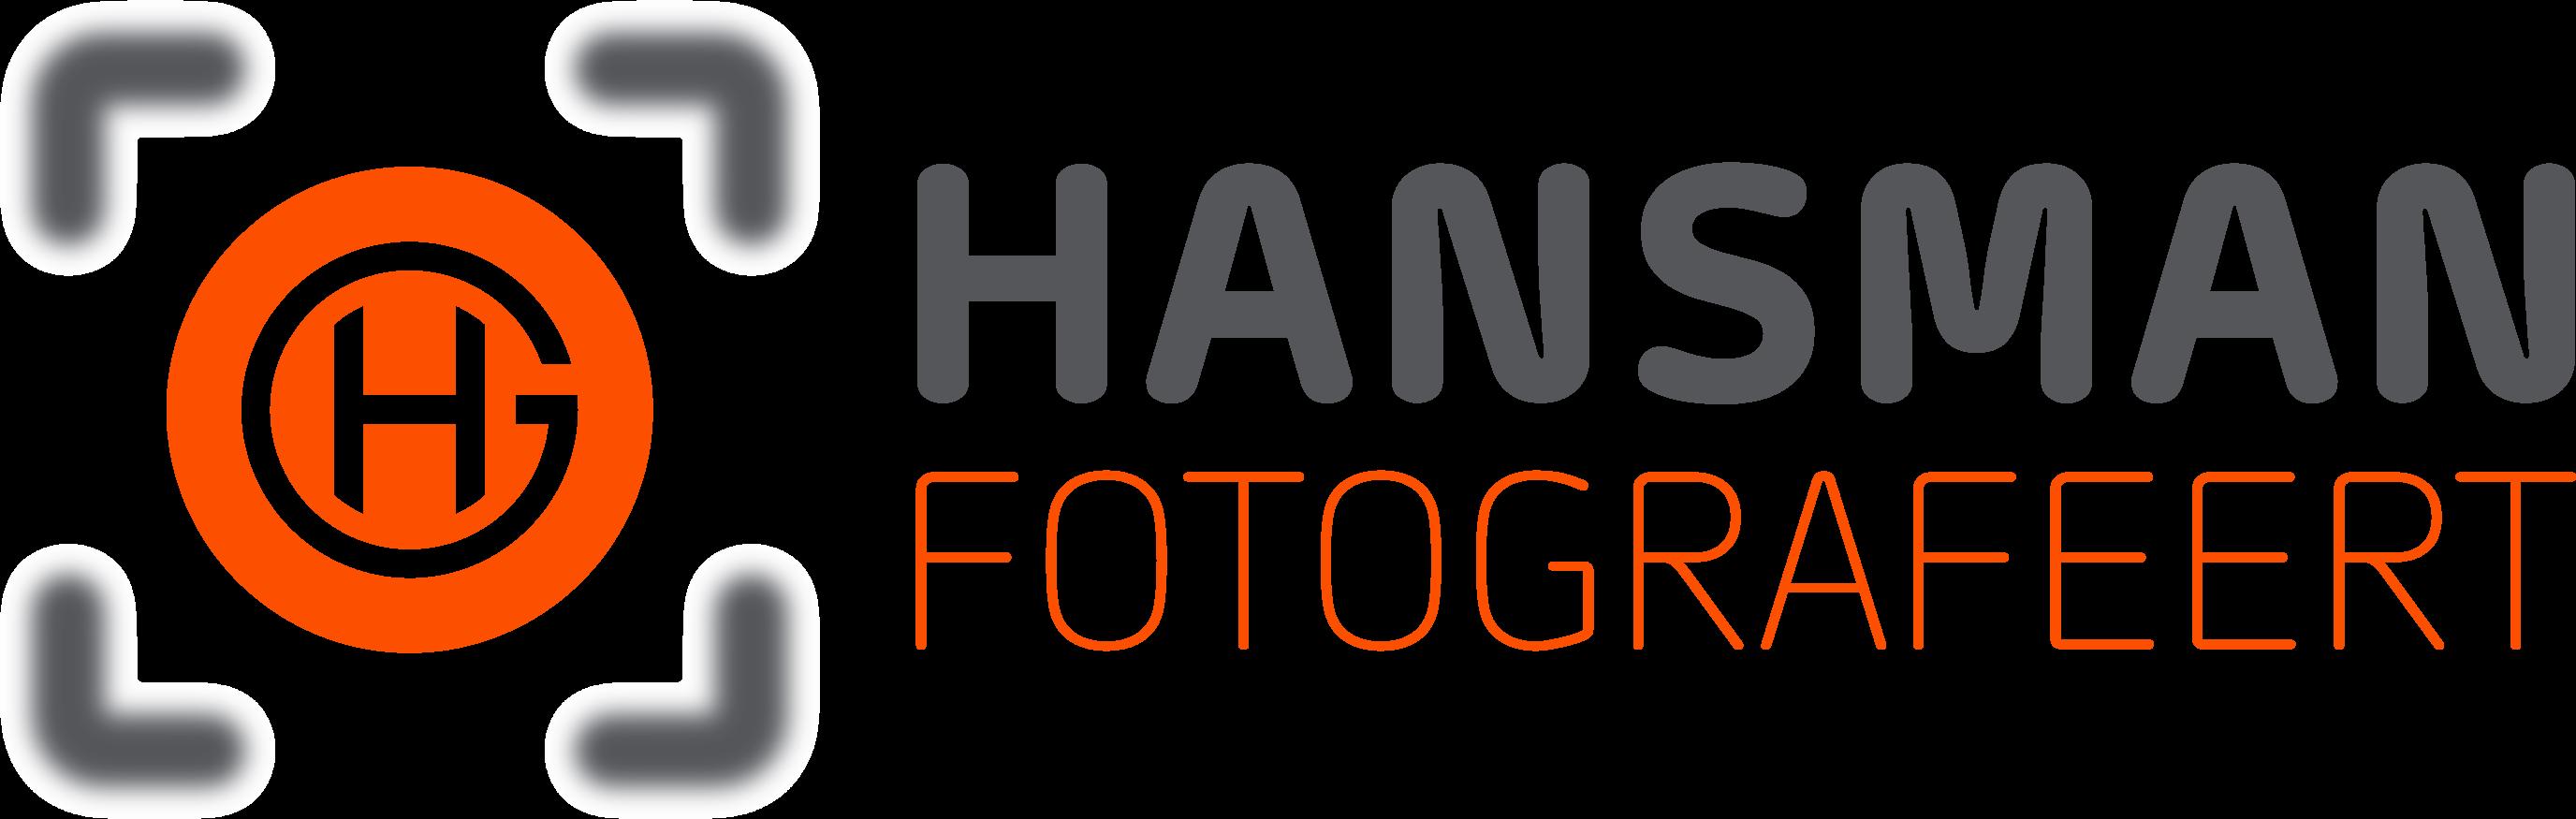 Hansman Fotografeert